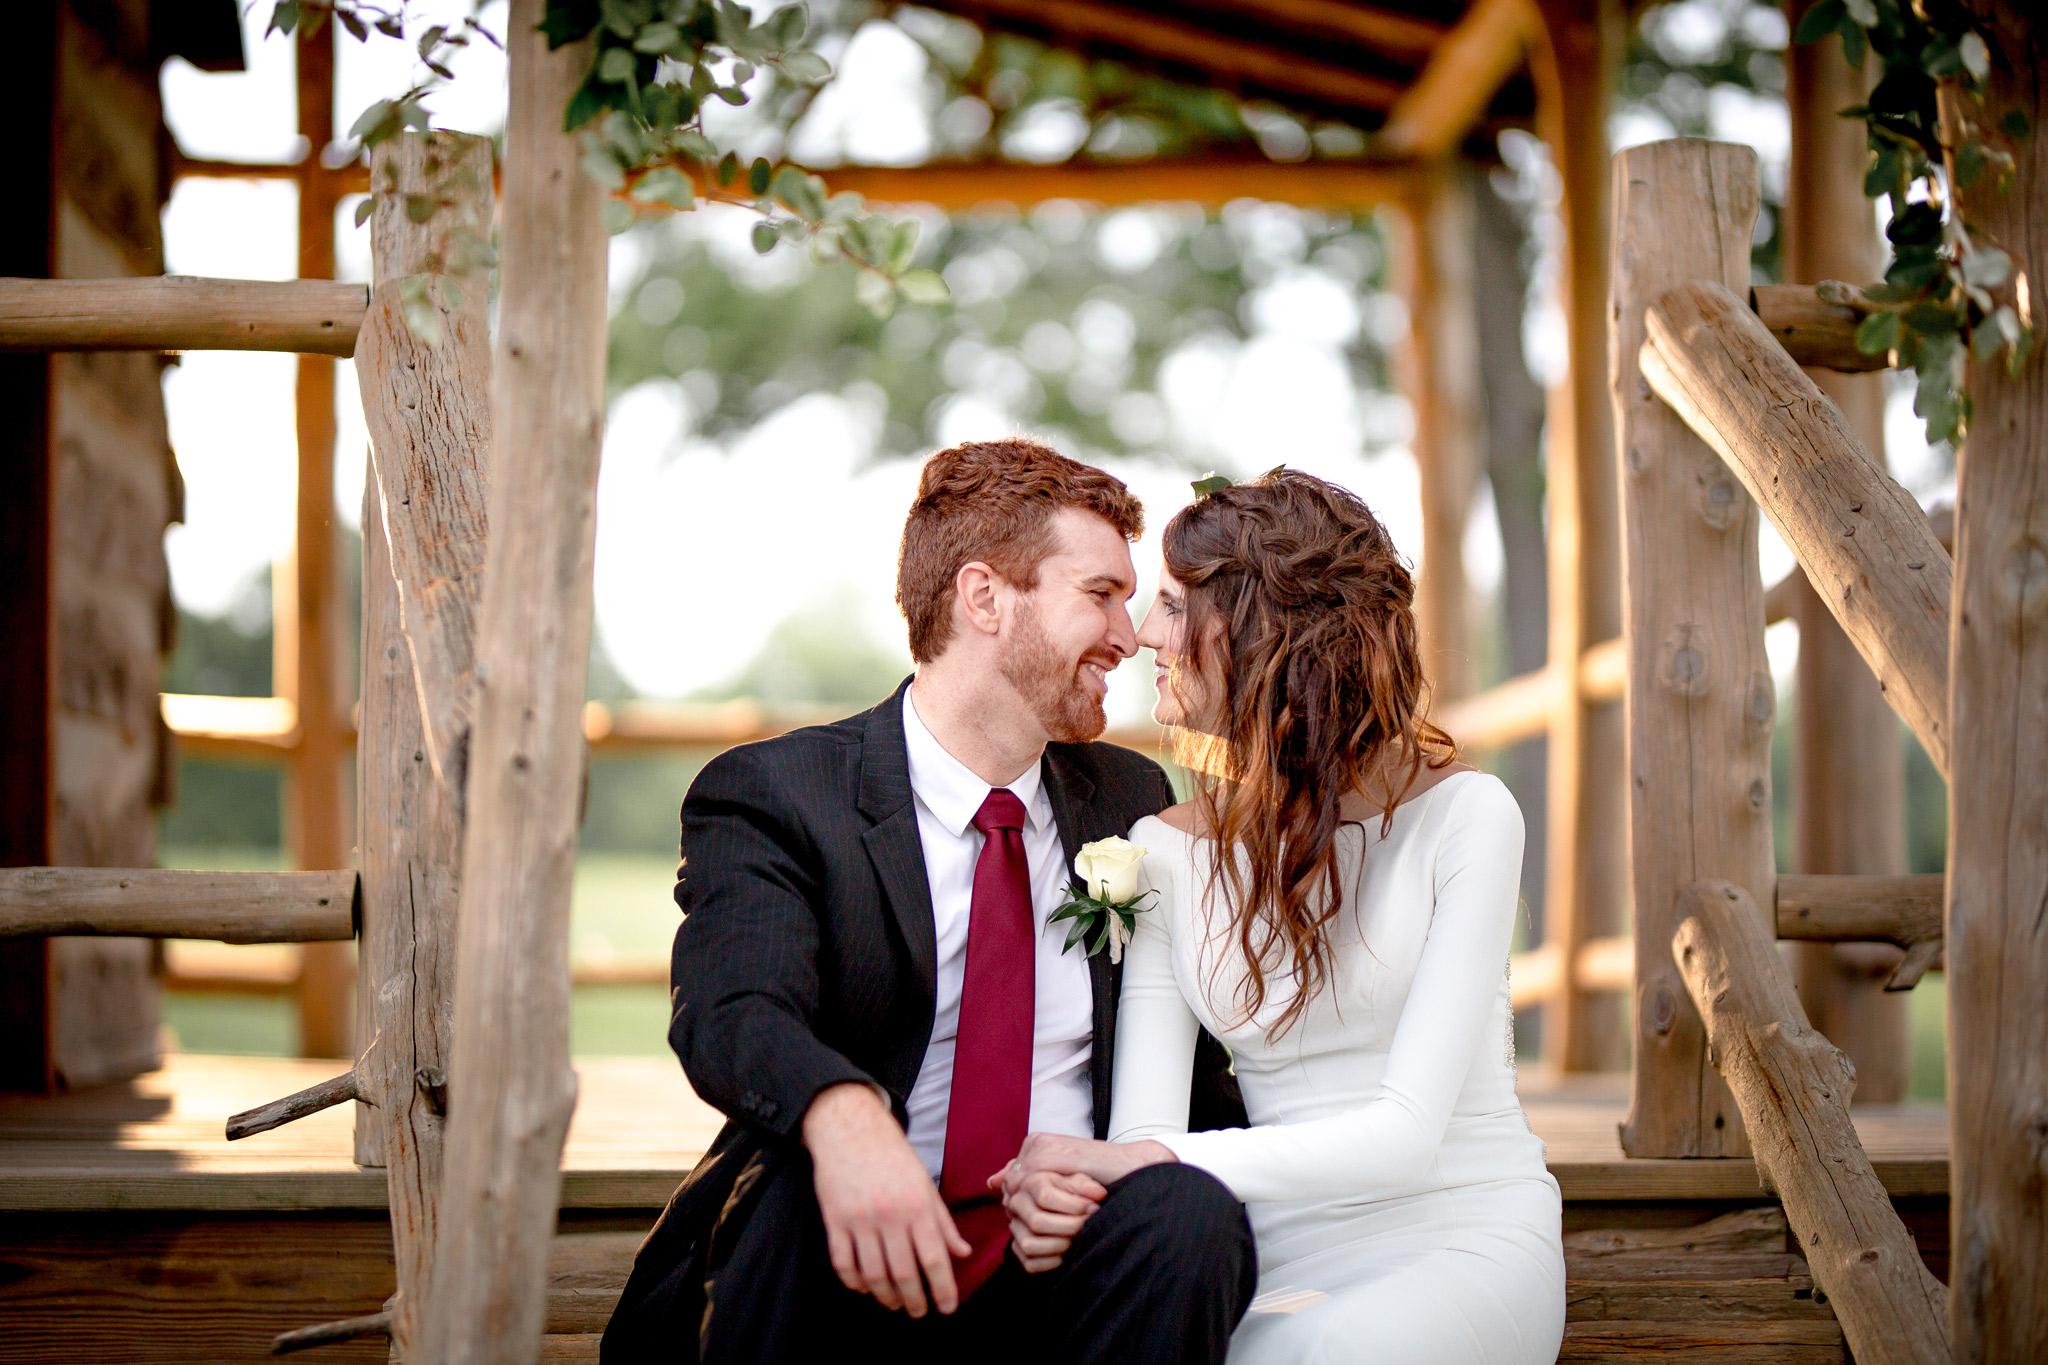 GaryBlakePhoto_Starhill_Wedding_183.jpg